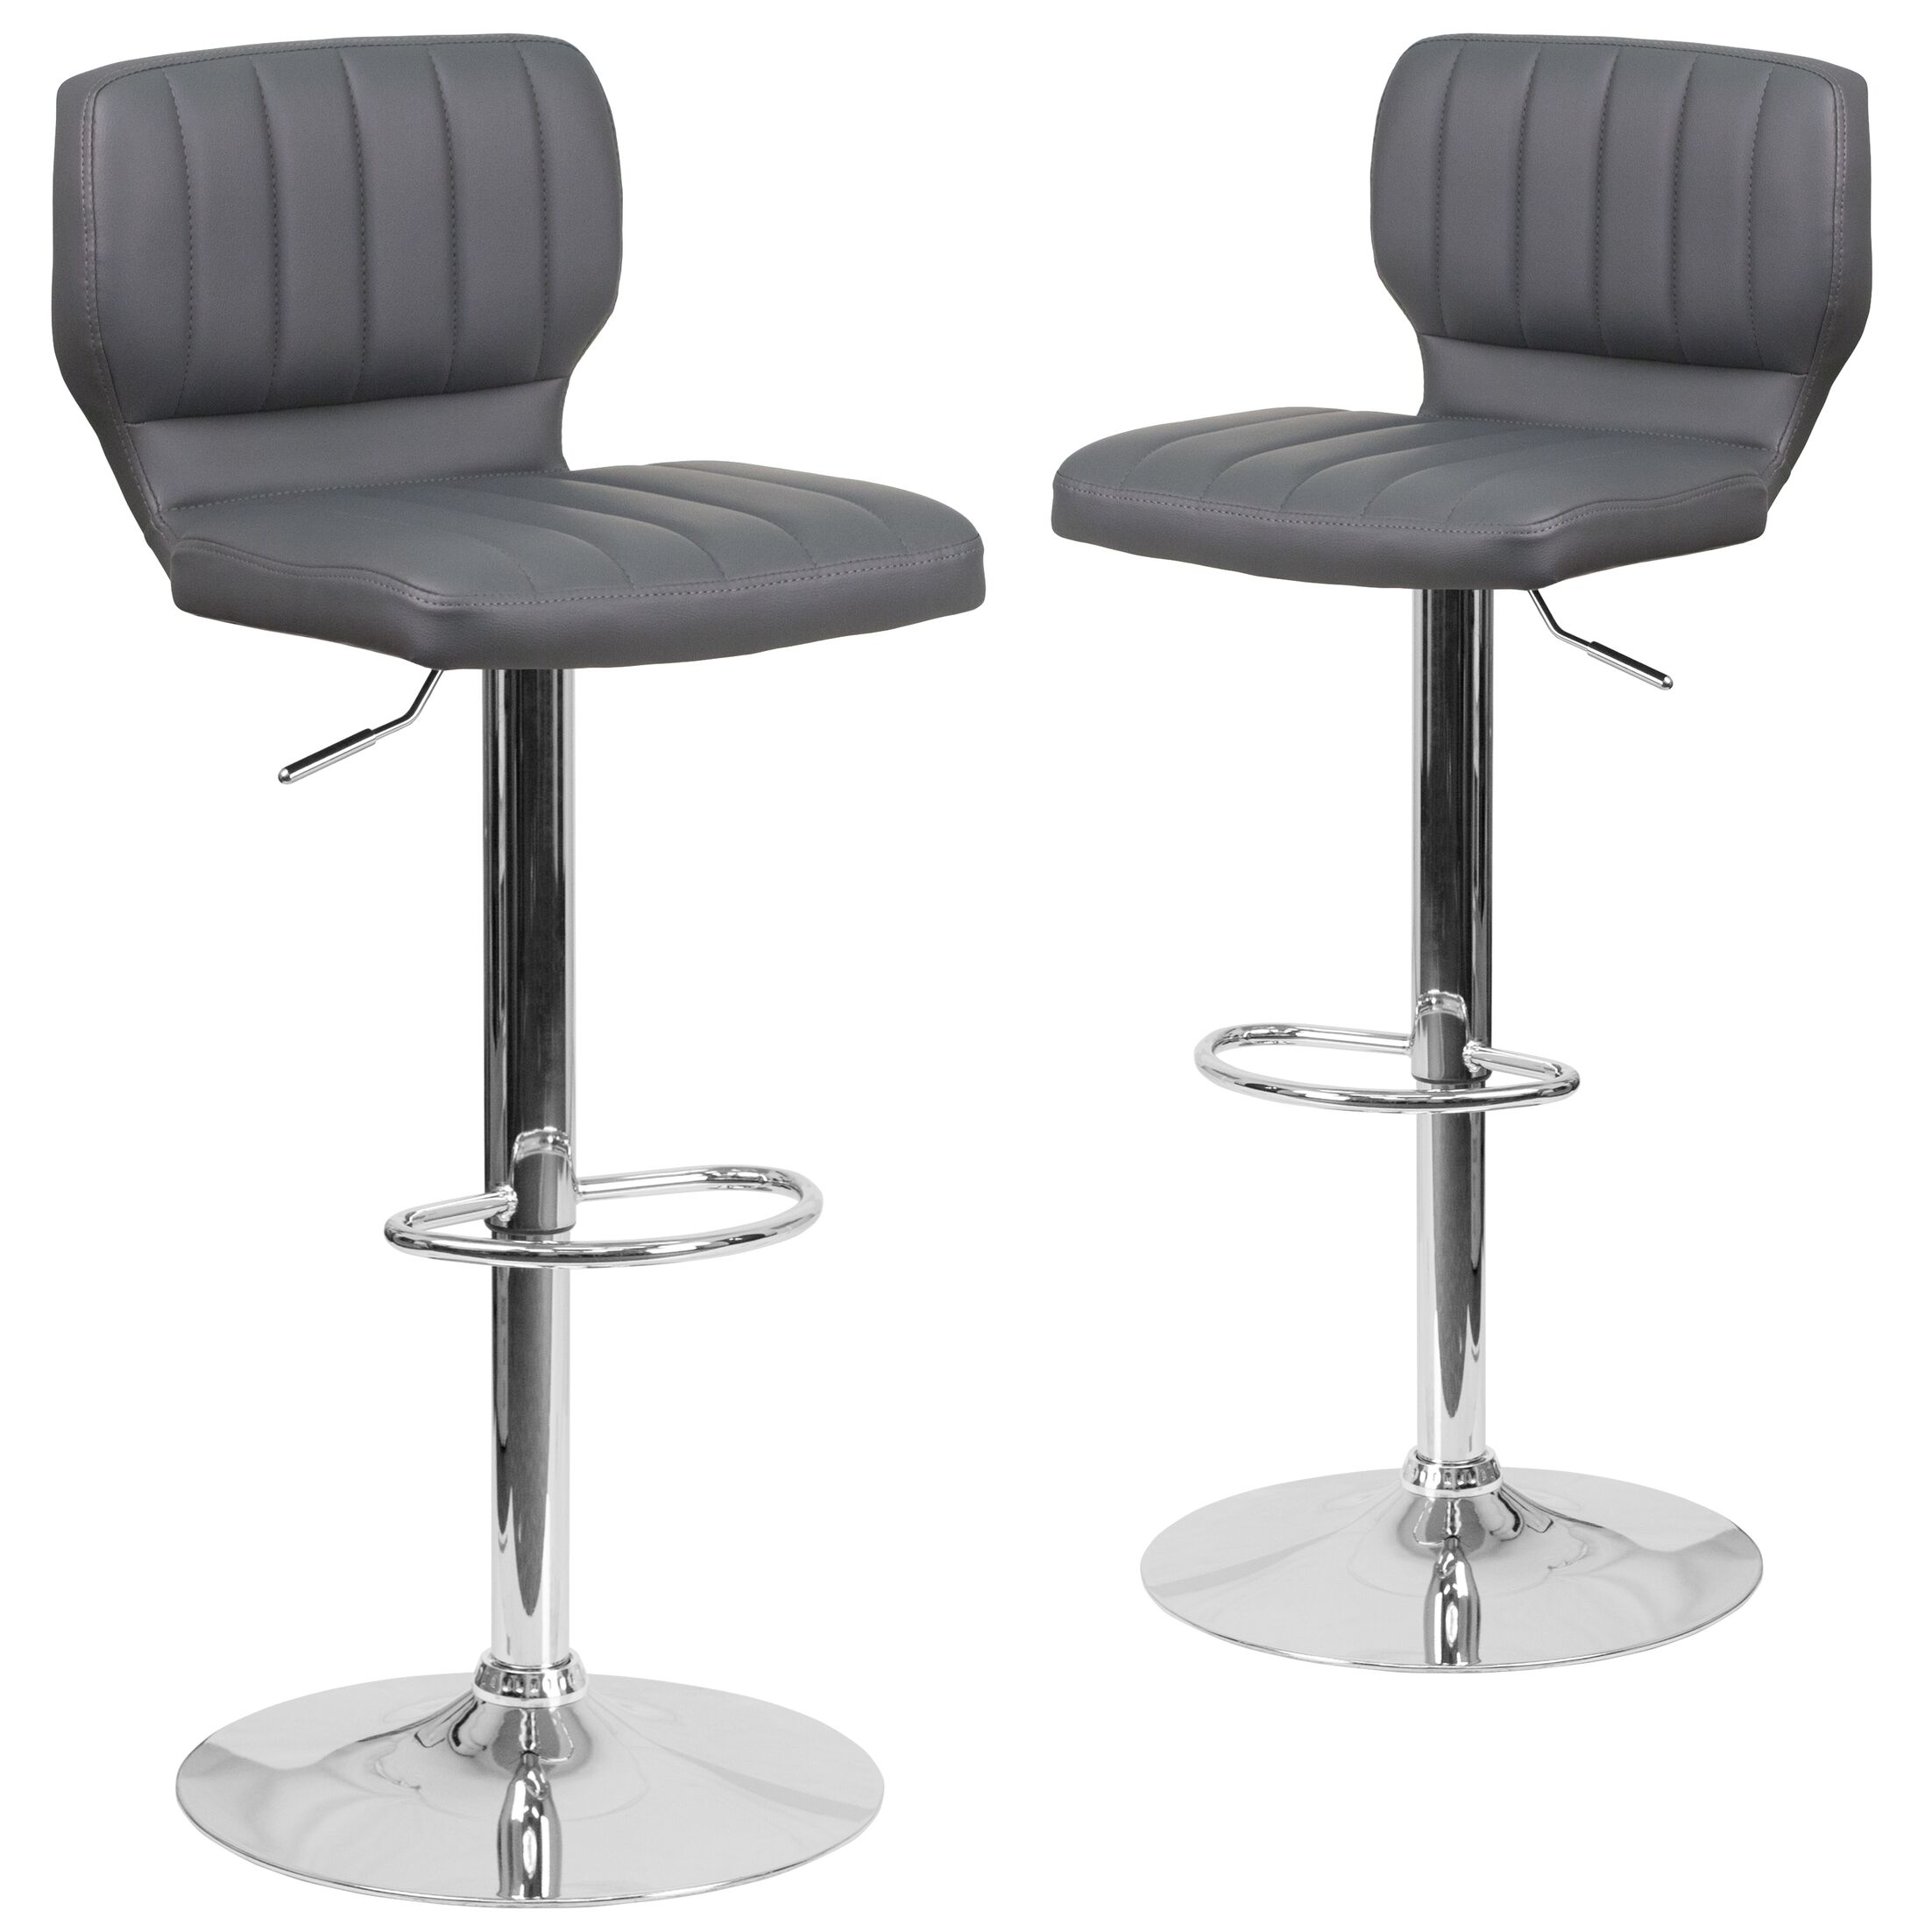 Norrell Adjustable Swivel Bar Stool Upholstery: Gray